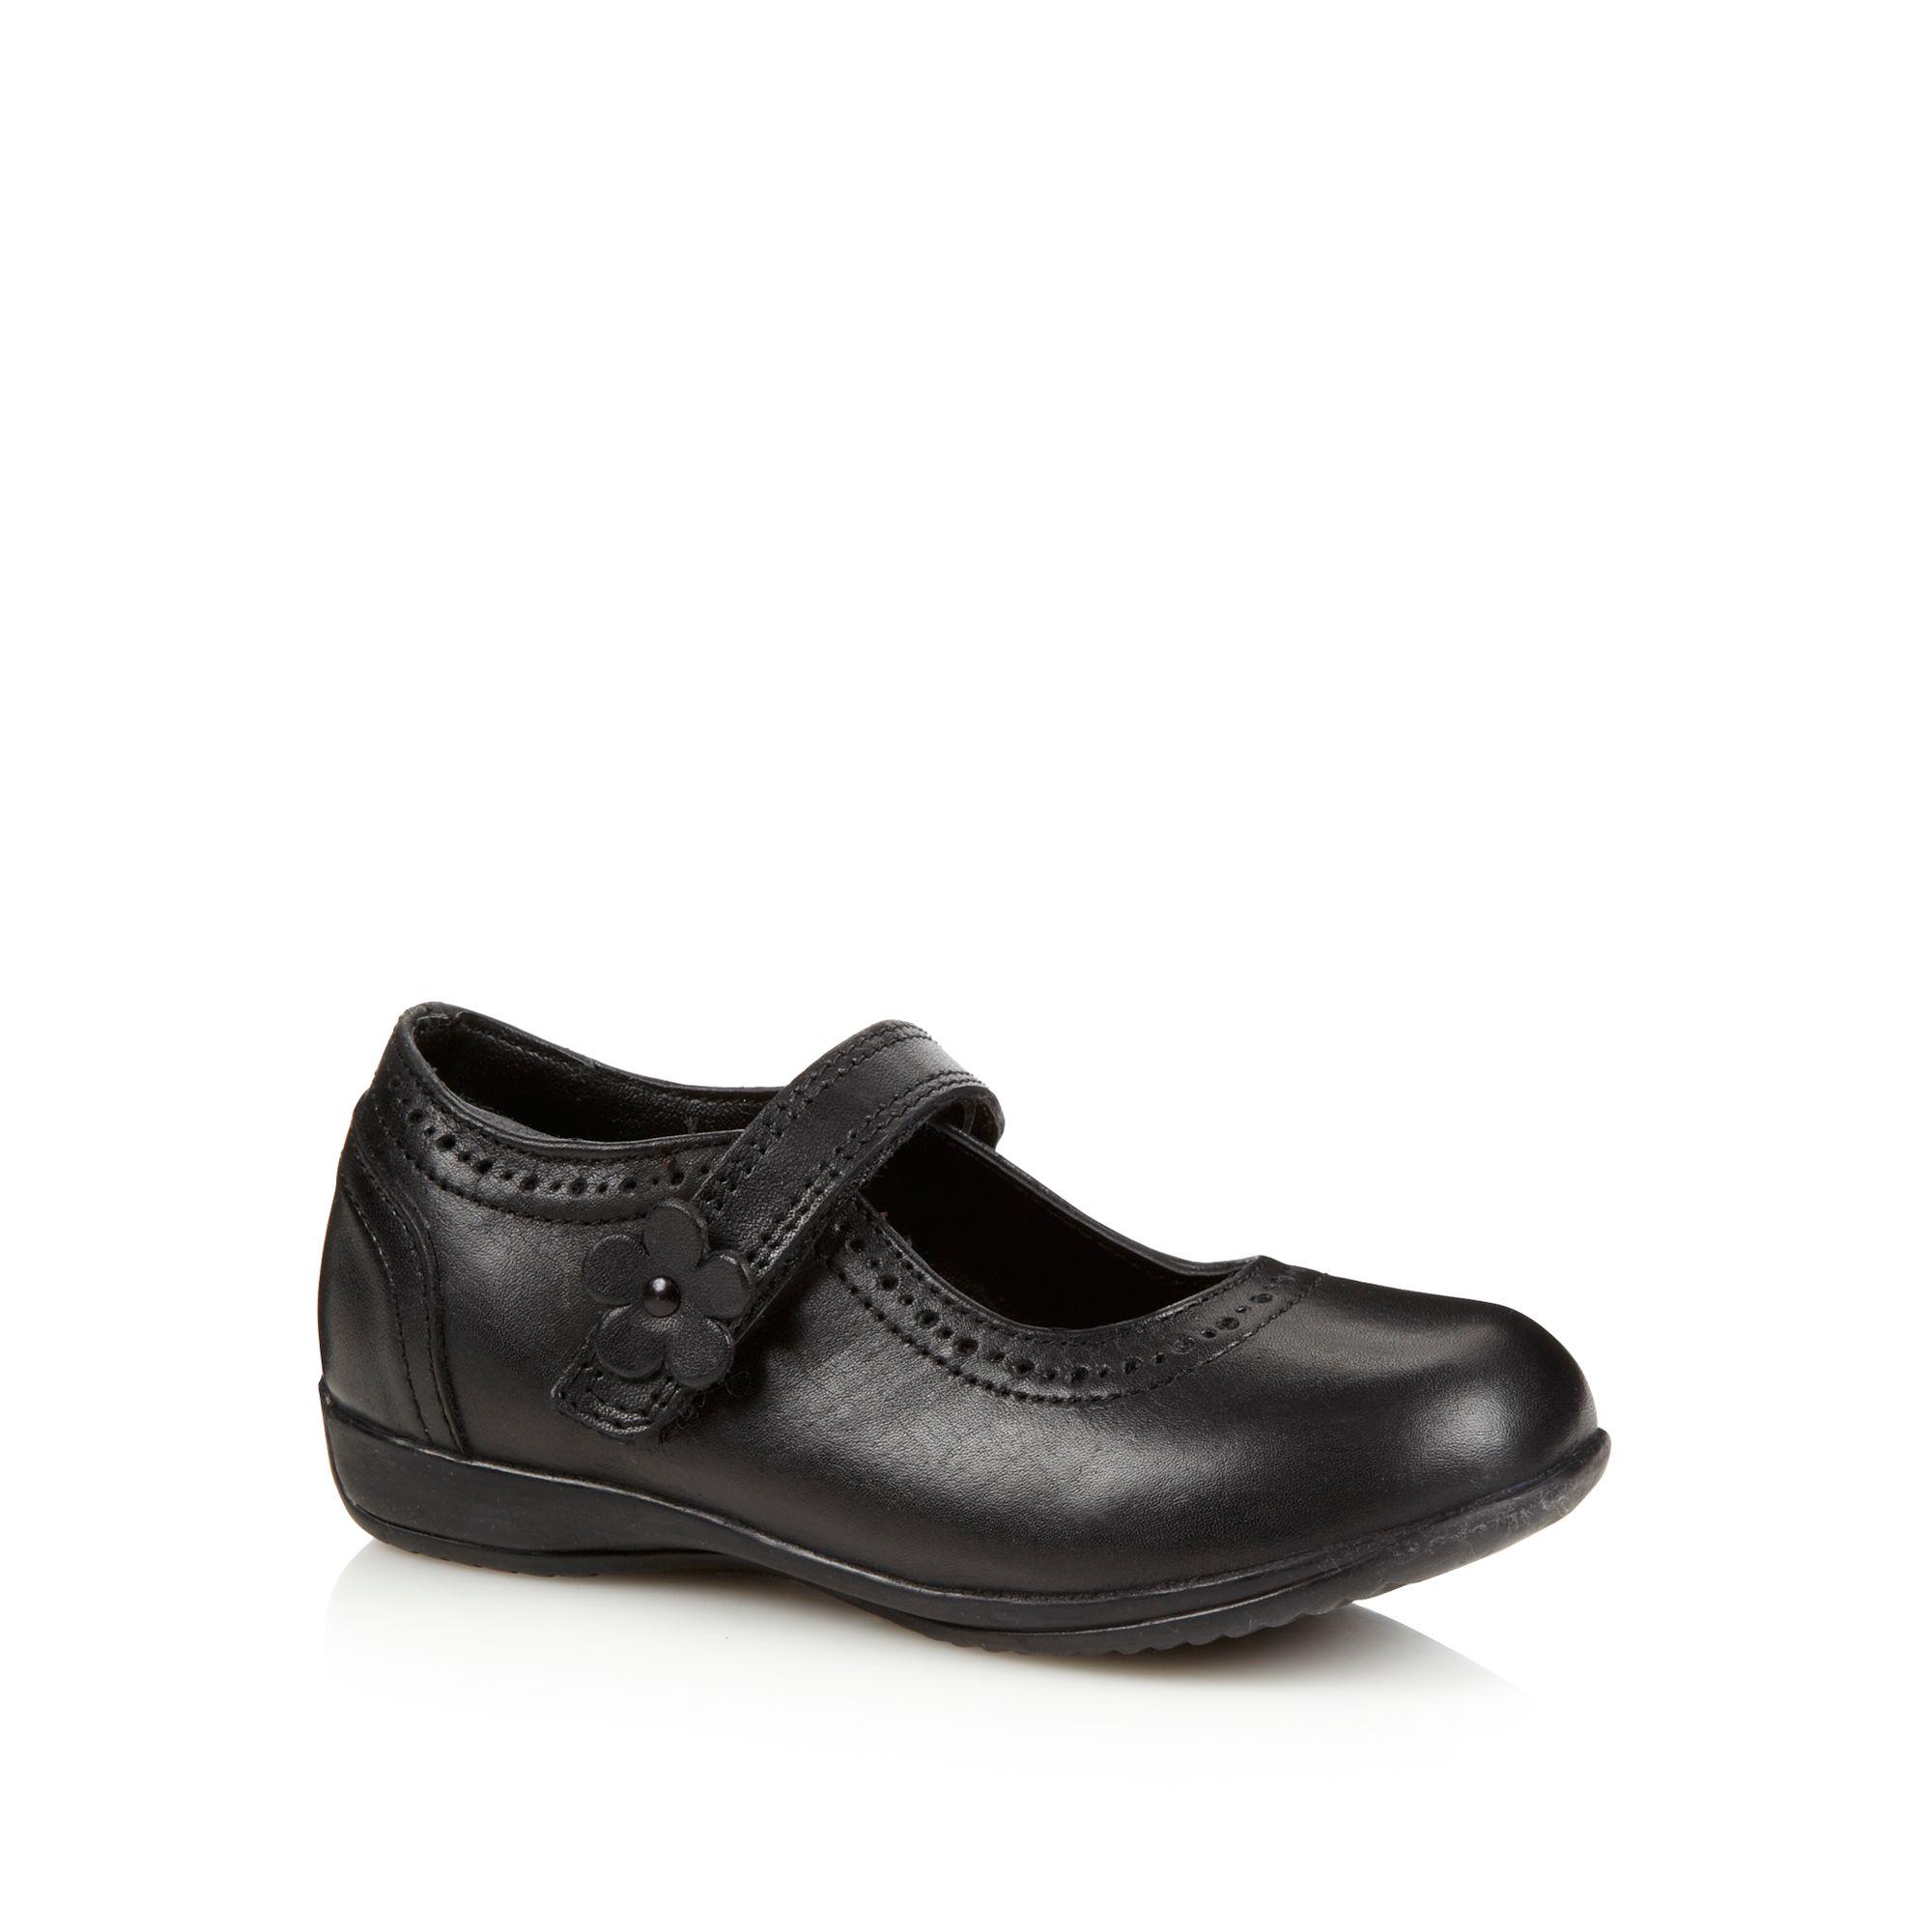 School Shoes Debemhams